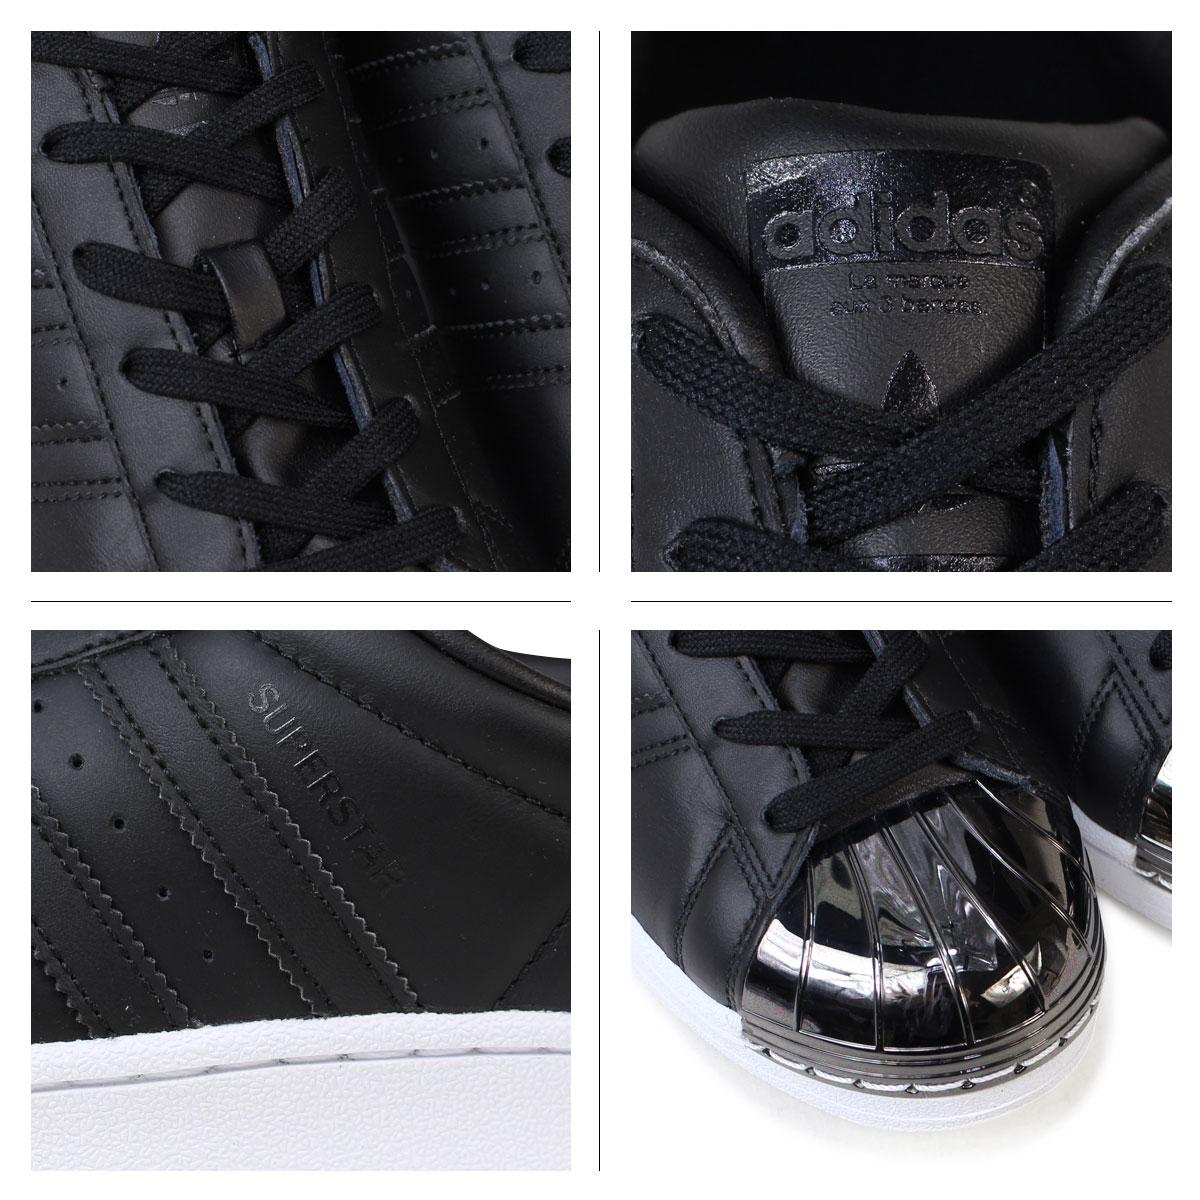 36ec9d391e Adidas superstar Lady s sneakers adidas originals SUPERSTAR METAL TOE W  BY2882 BY2883 shoes white black originals  1 17 Shinnyu load